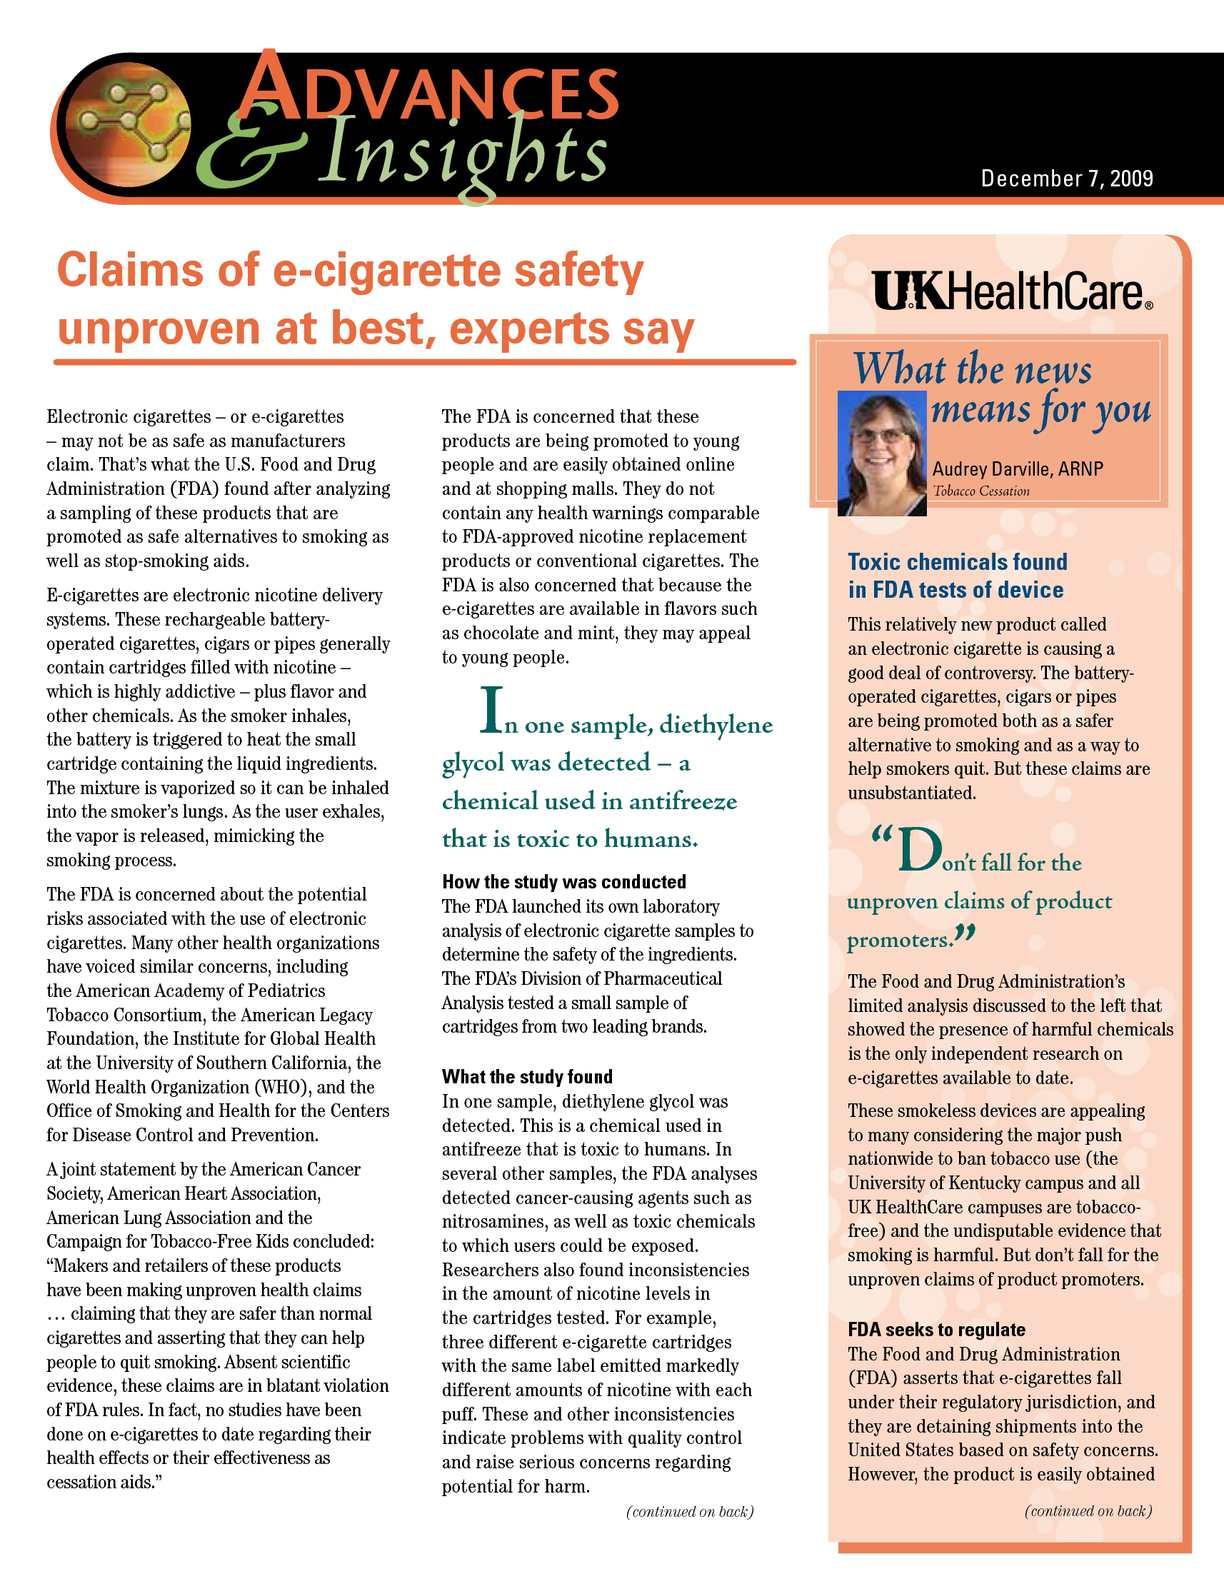 electronic cigarette samples